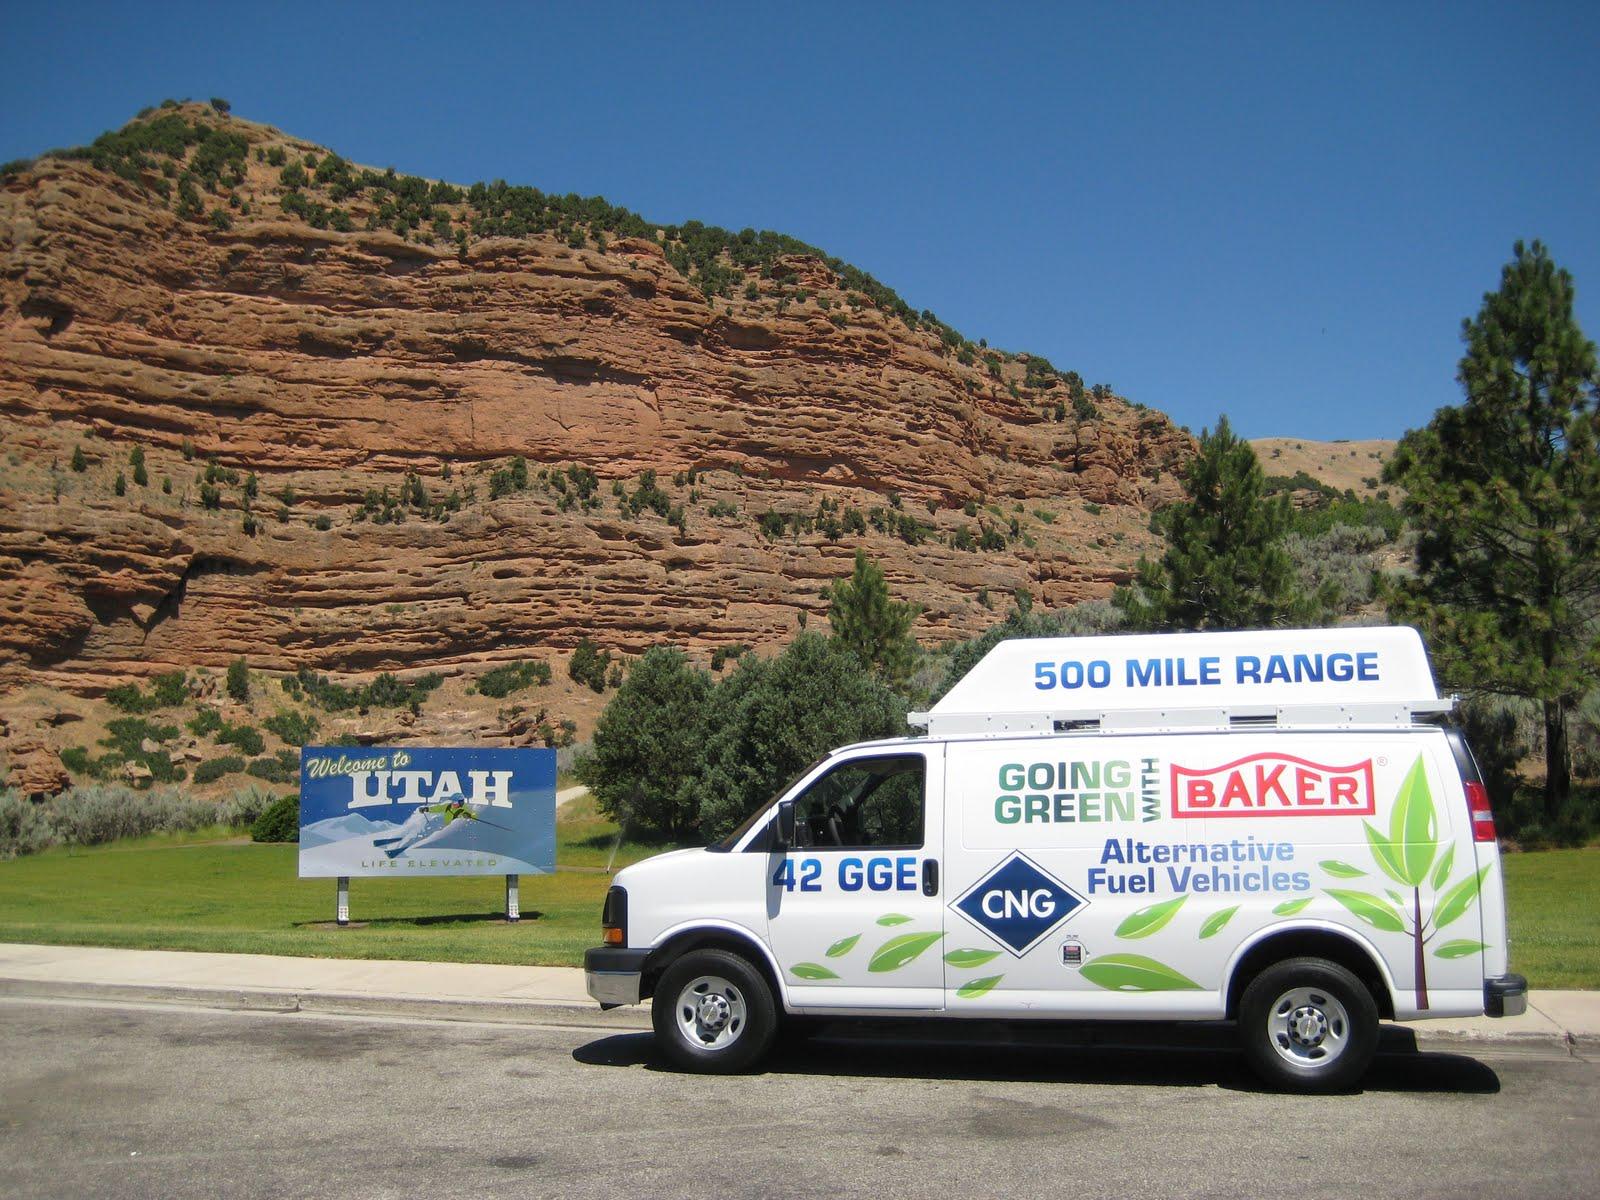 Baker Shows Off Their Long Range CNG Van Conversion